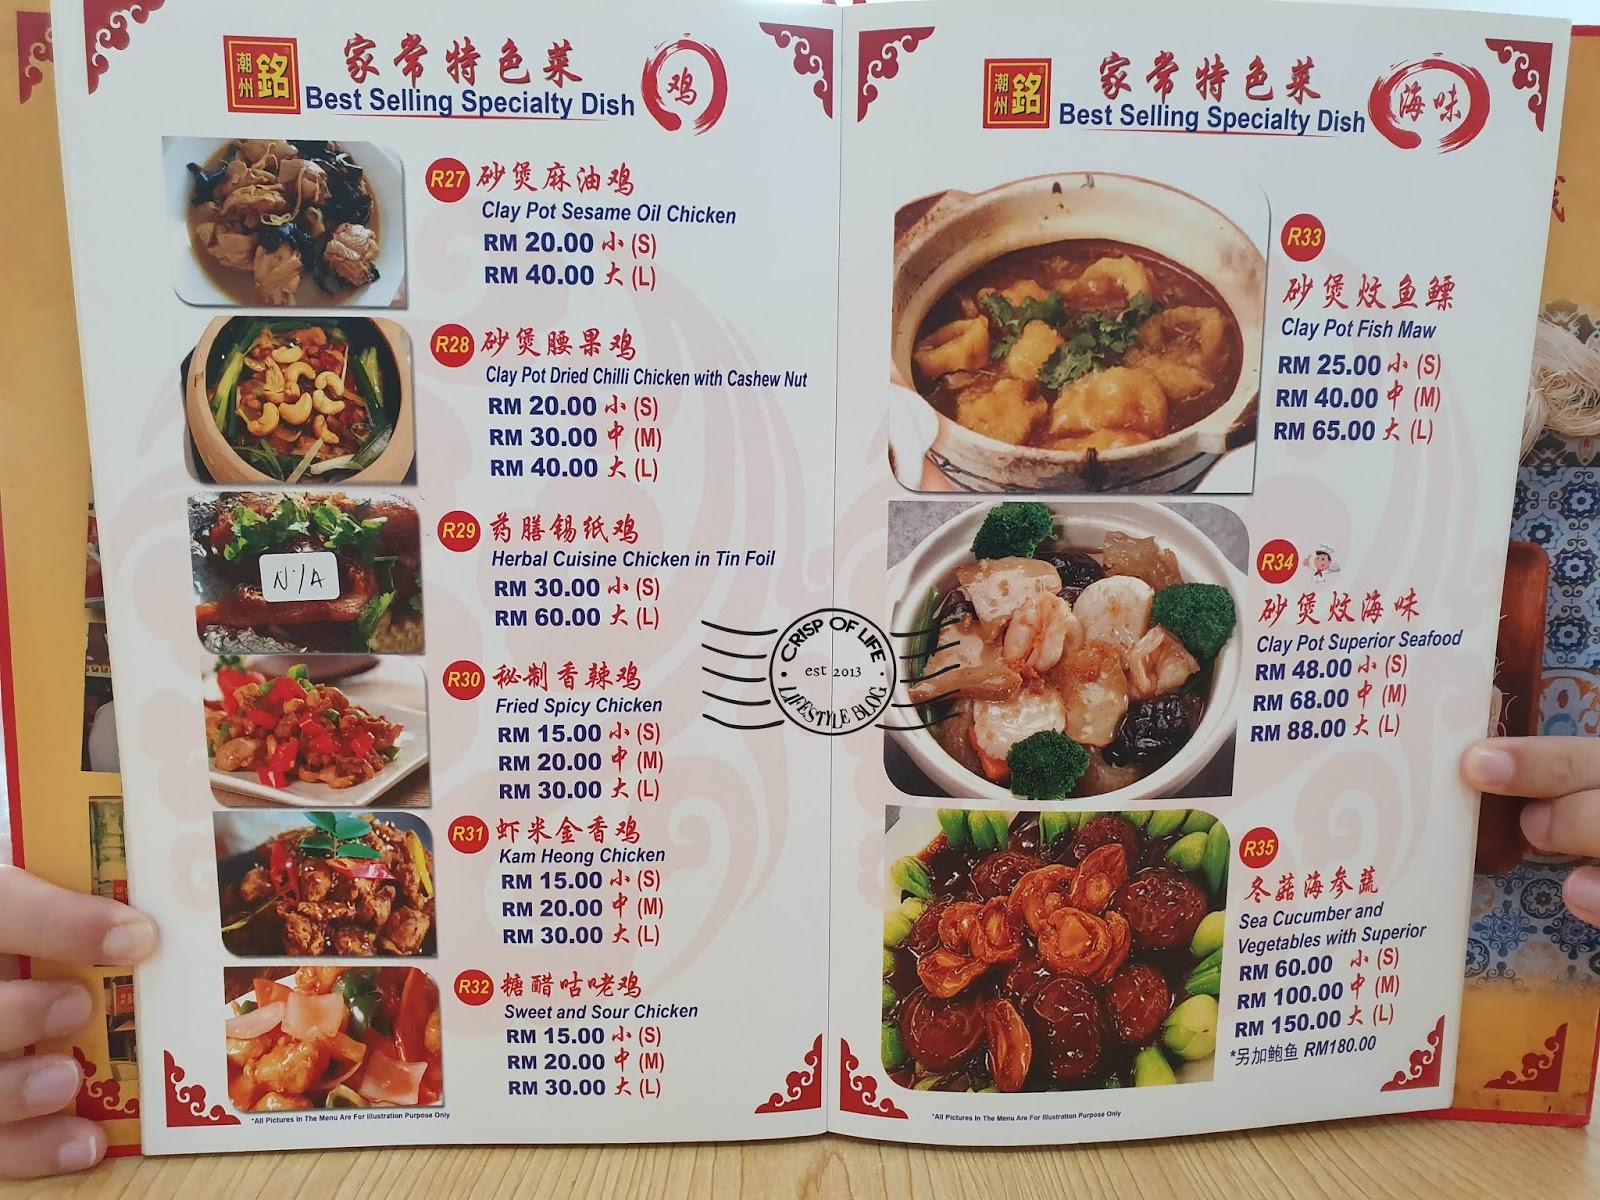 Restoran Teow Chew Meng 潮州銘中餐厅 @ Summerskye, Bayan Lepas, Penang